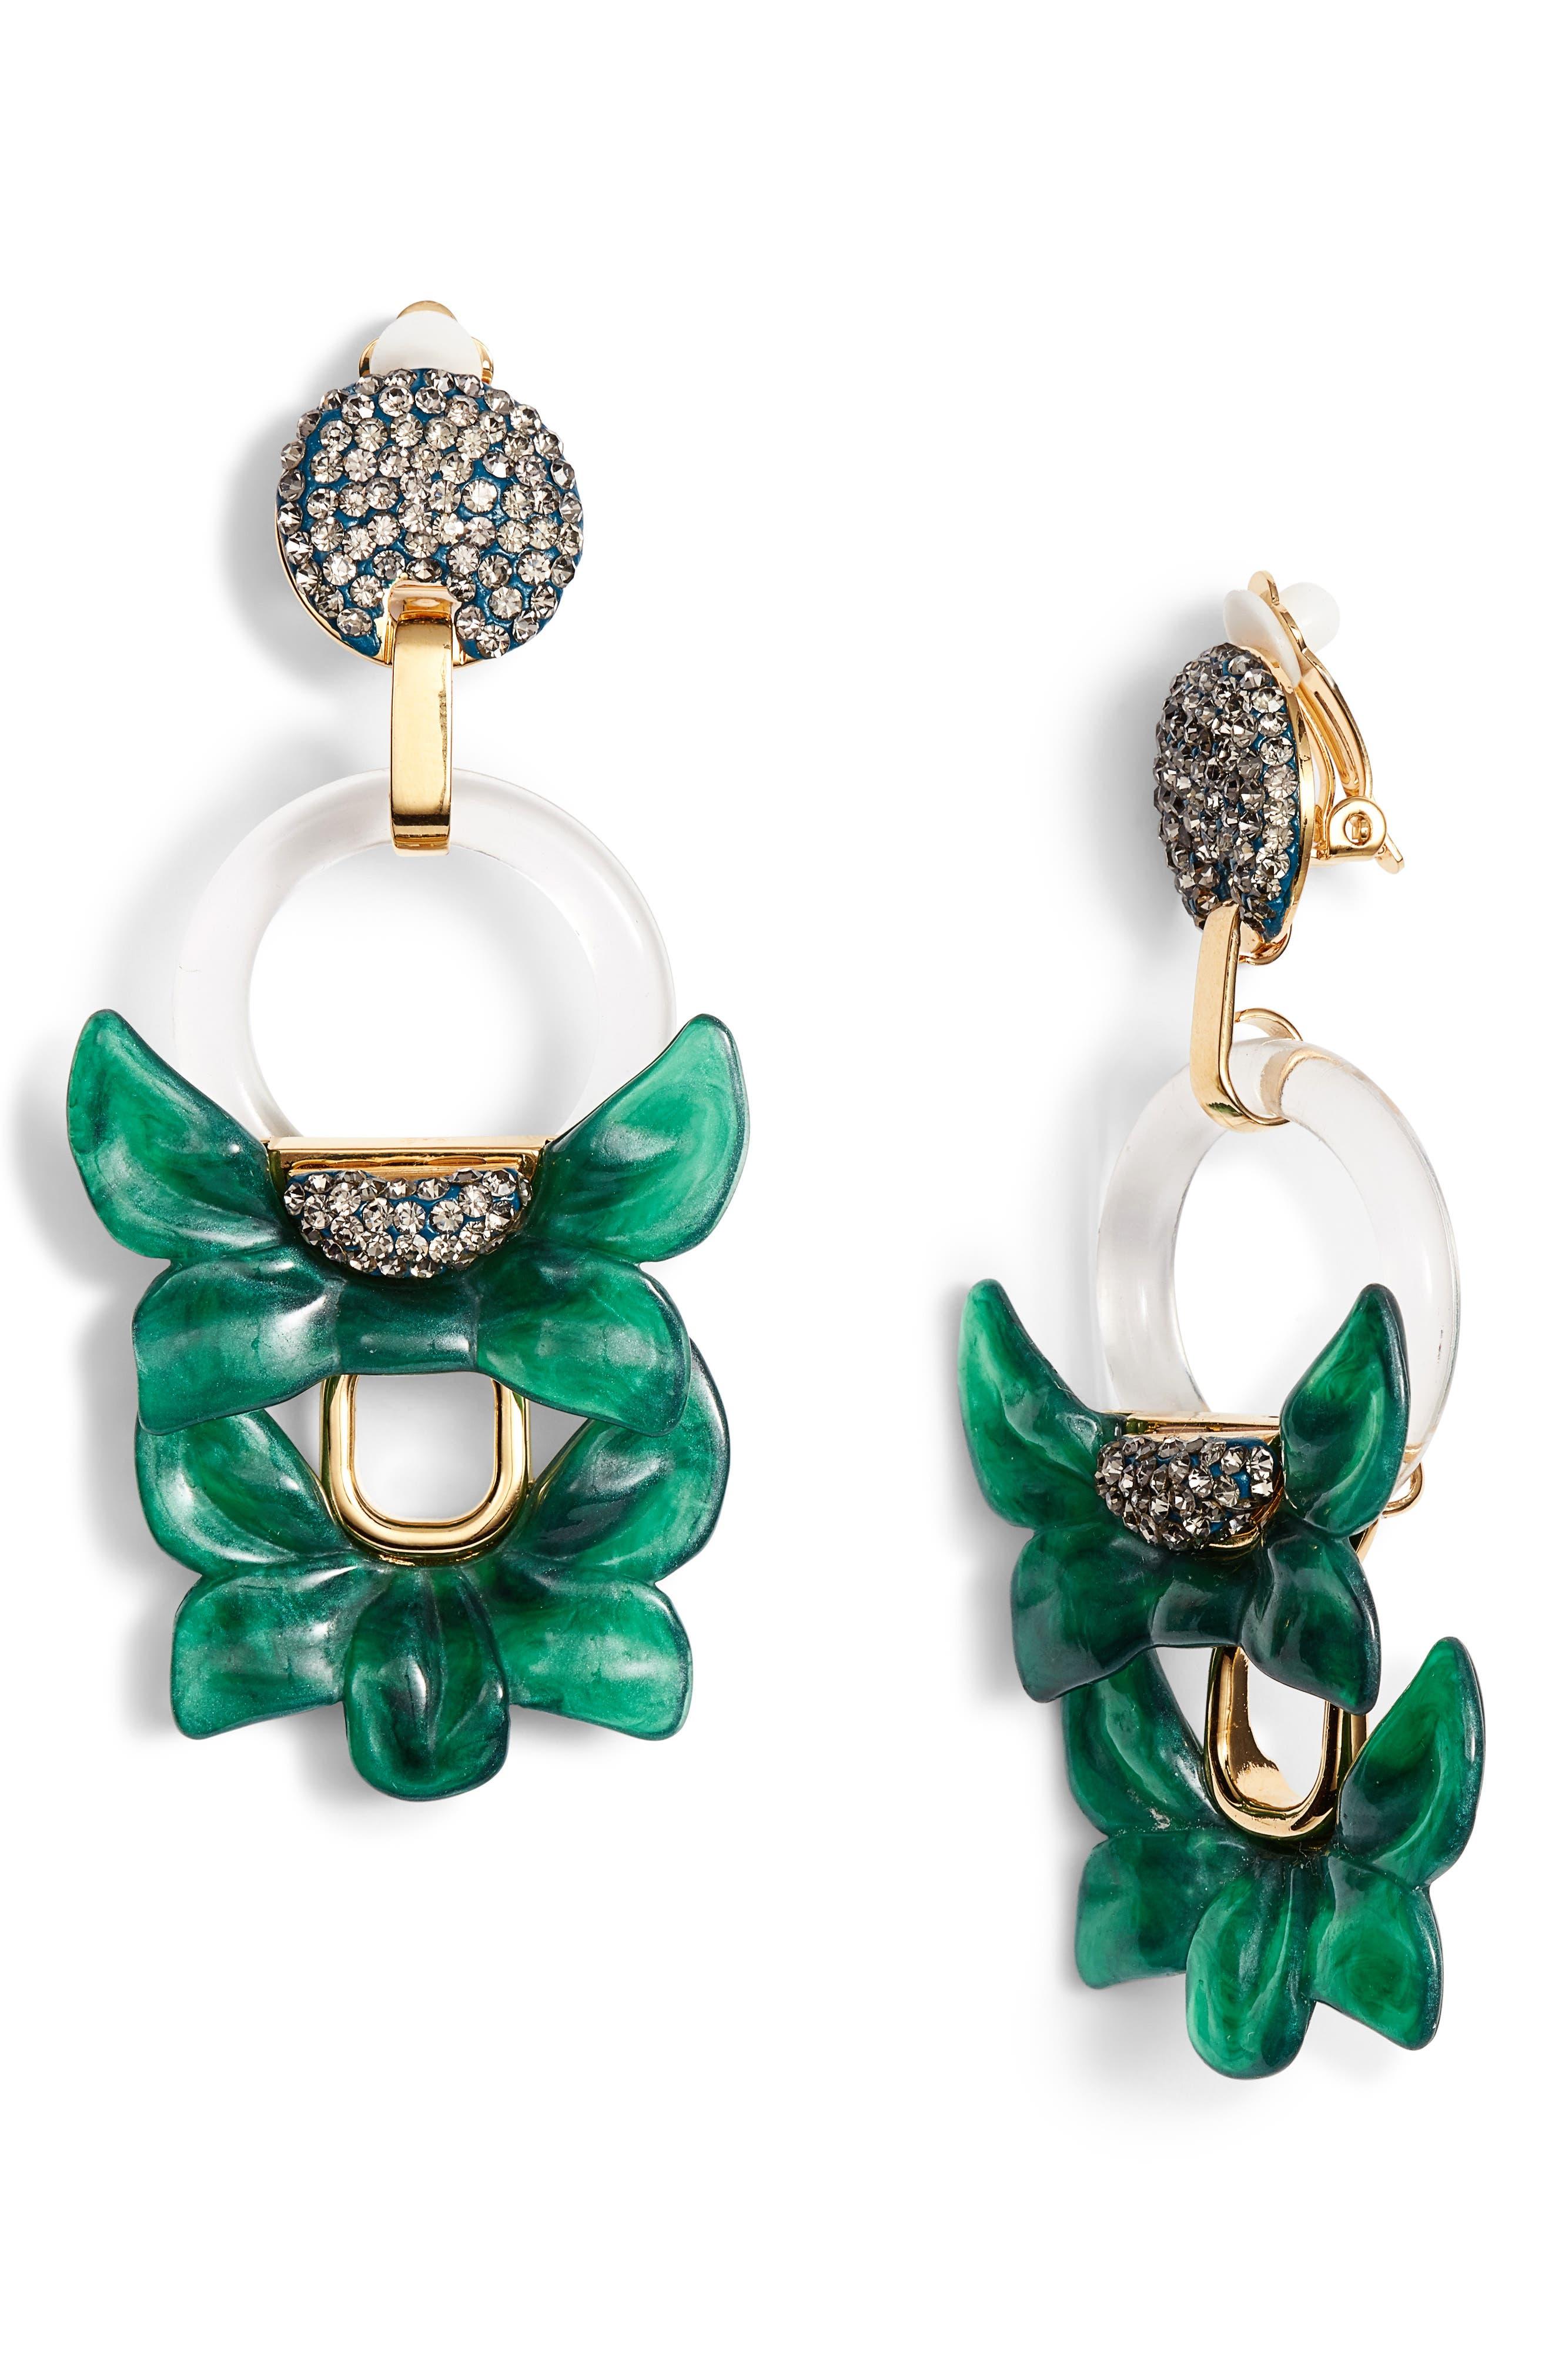 Rio Clip Drop Earrings,                             Main thumbnail 1, color,                             300